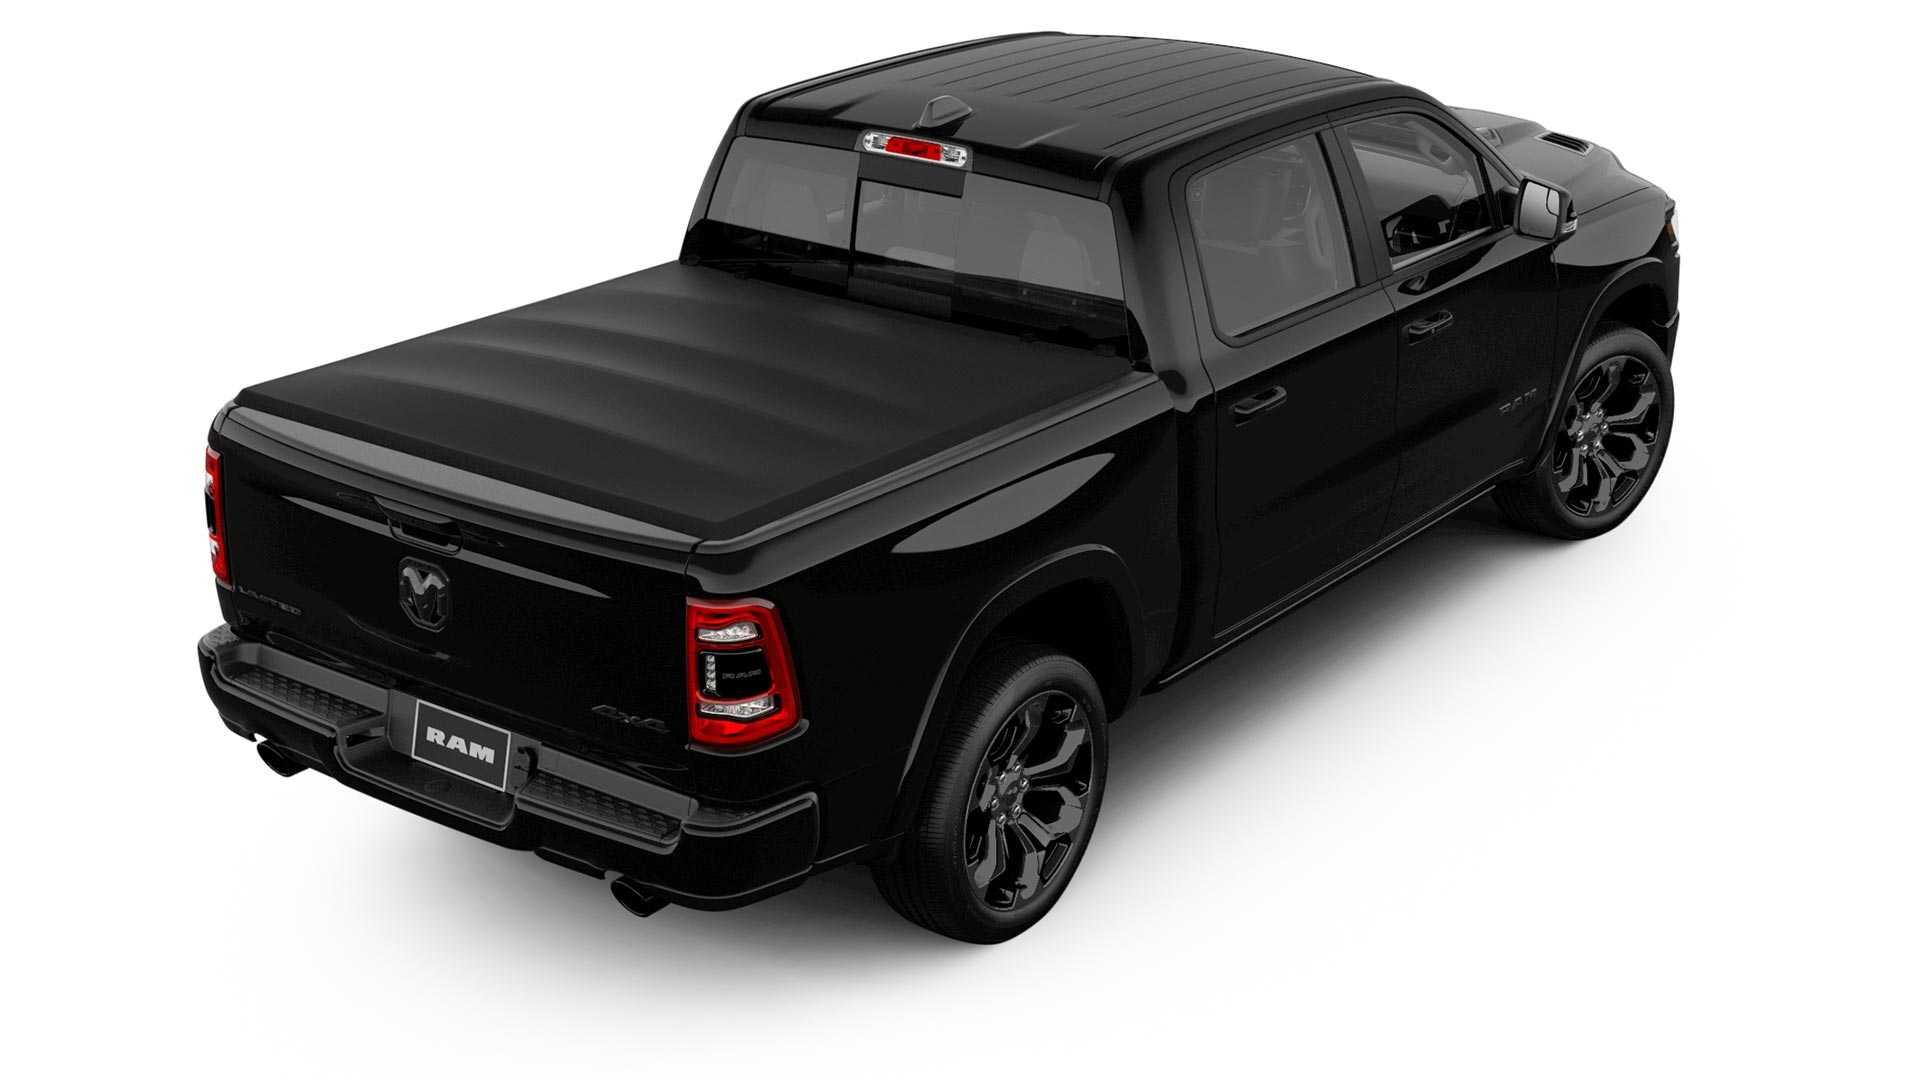 ram-1500-limited-black-edition-1